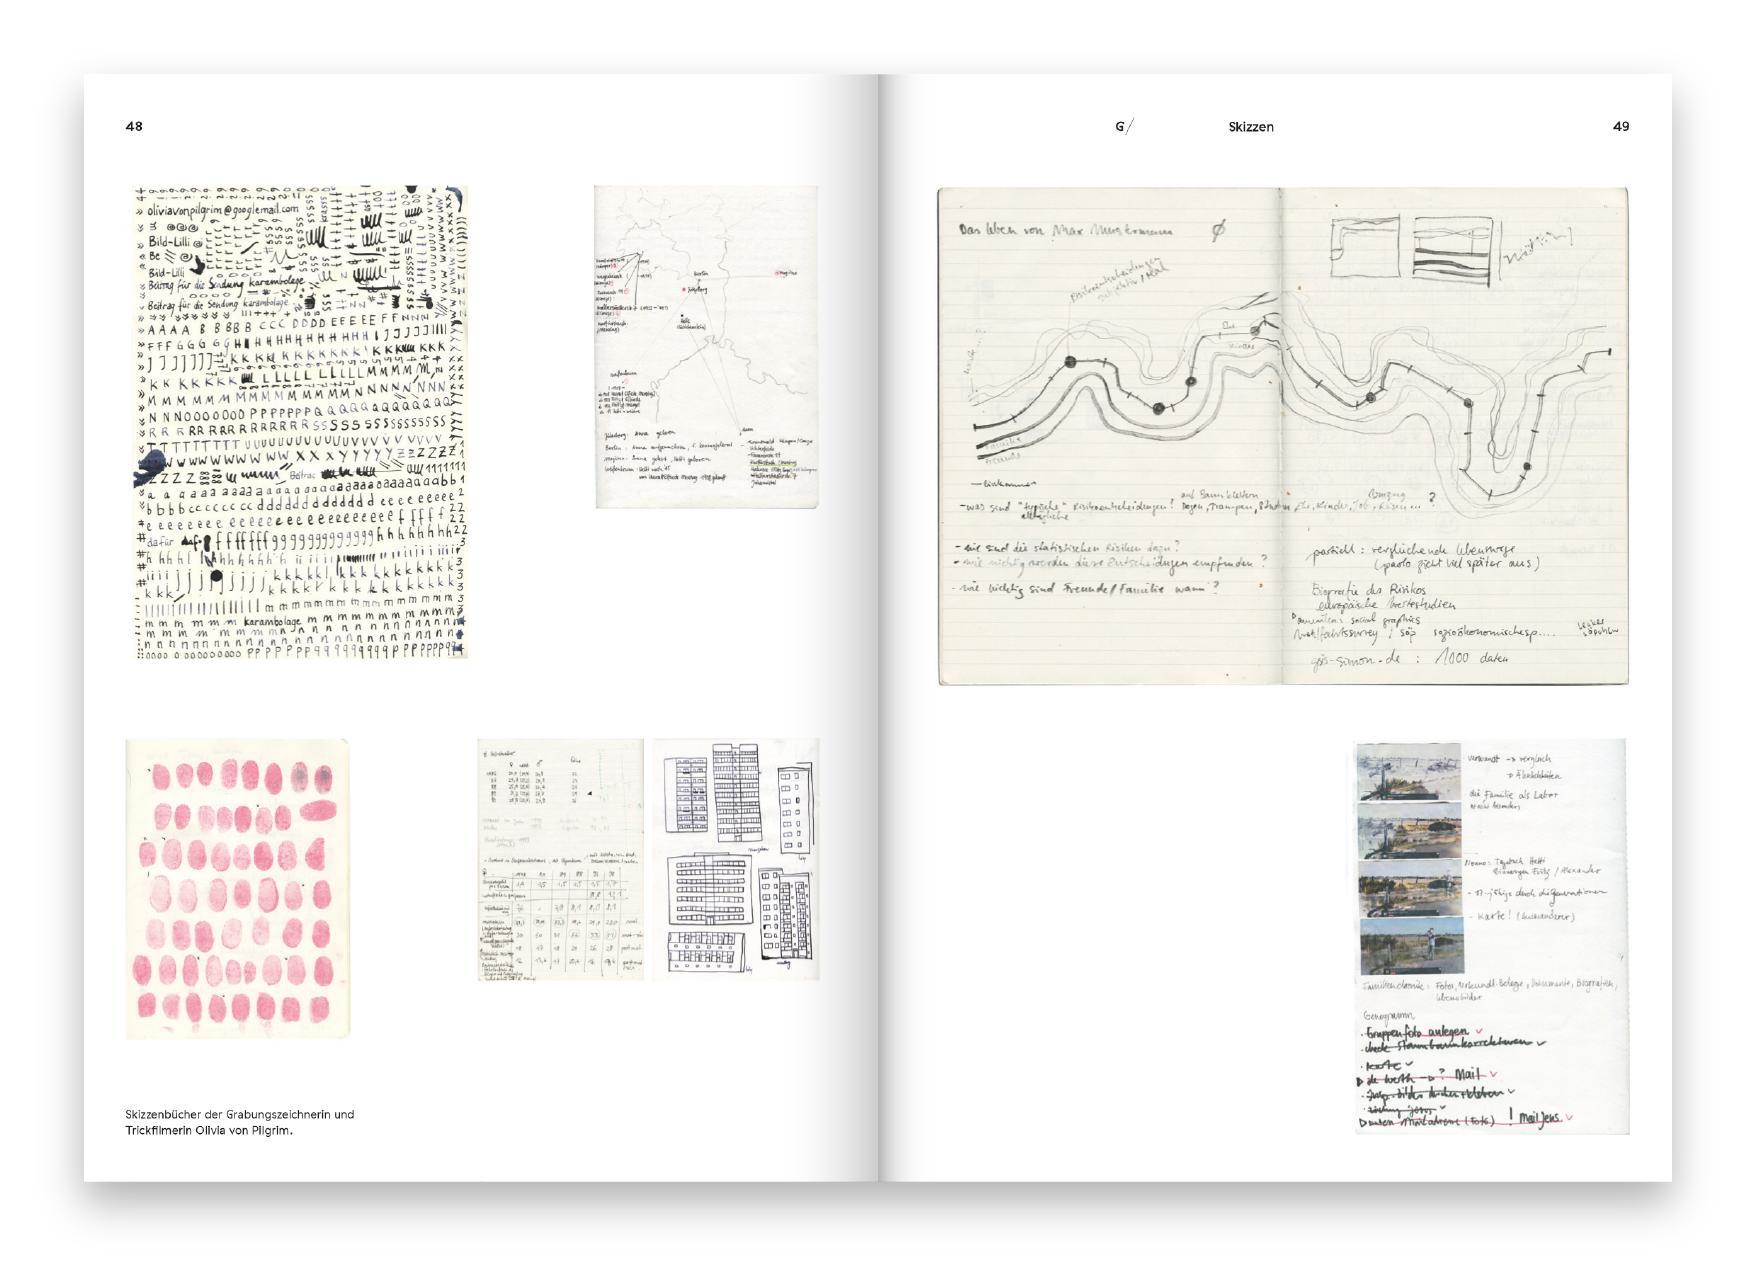 codes-of-collaboration-isabel-kronenberger-buch-06